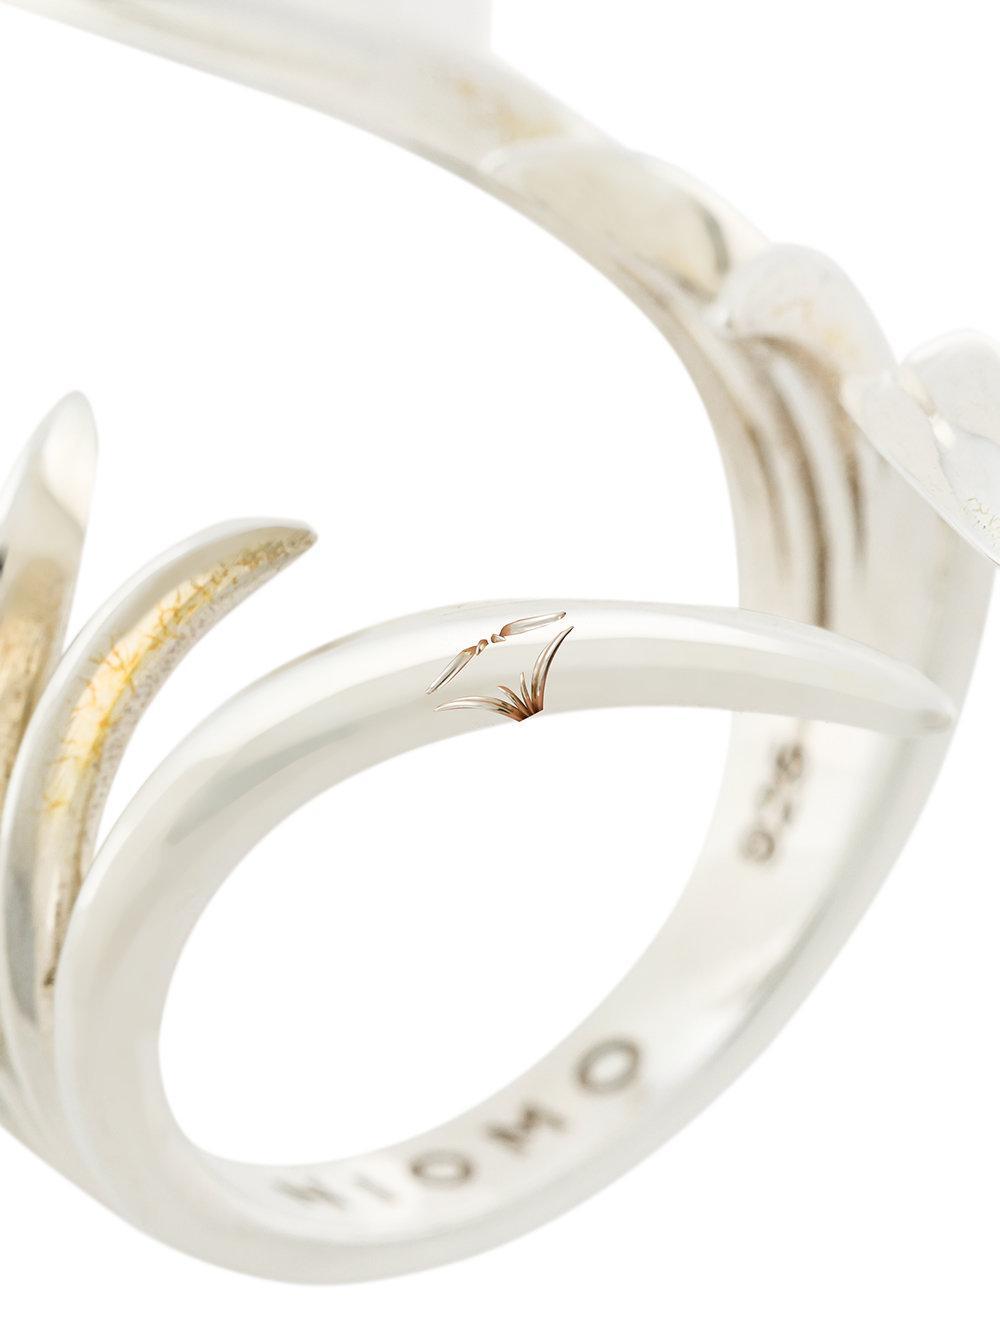 Niomo Nypa ring - Metallic ysm8WUOlP